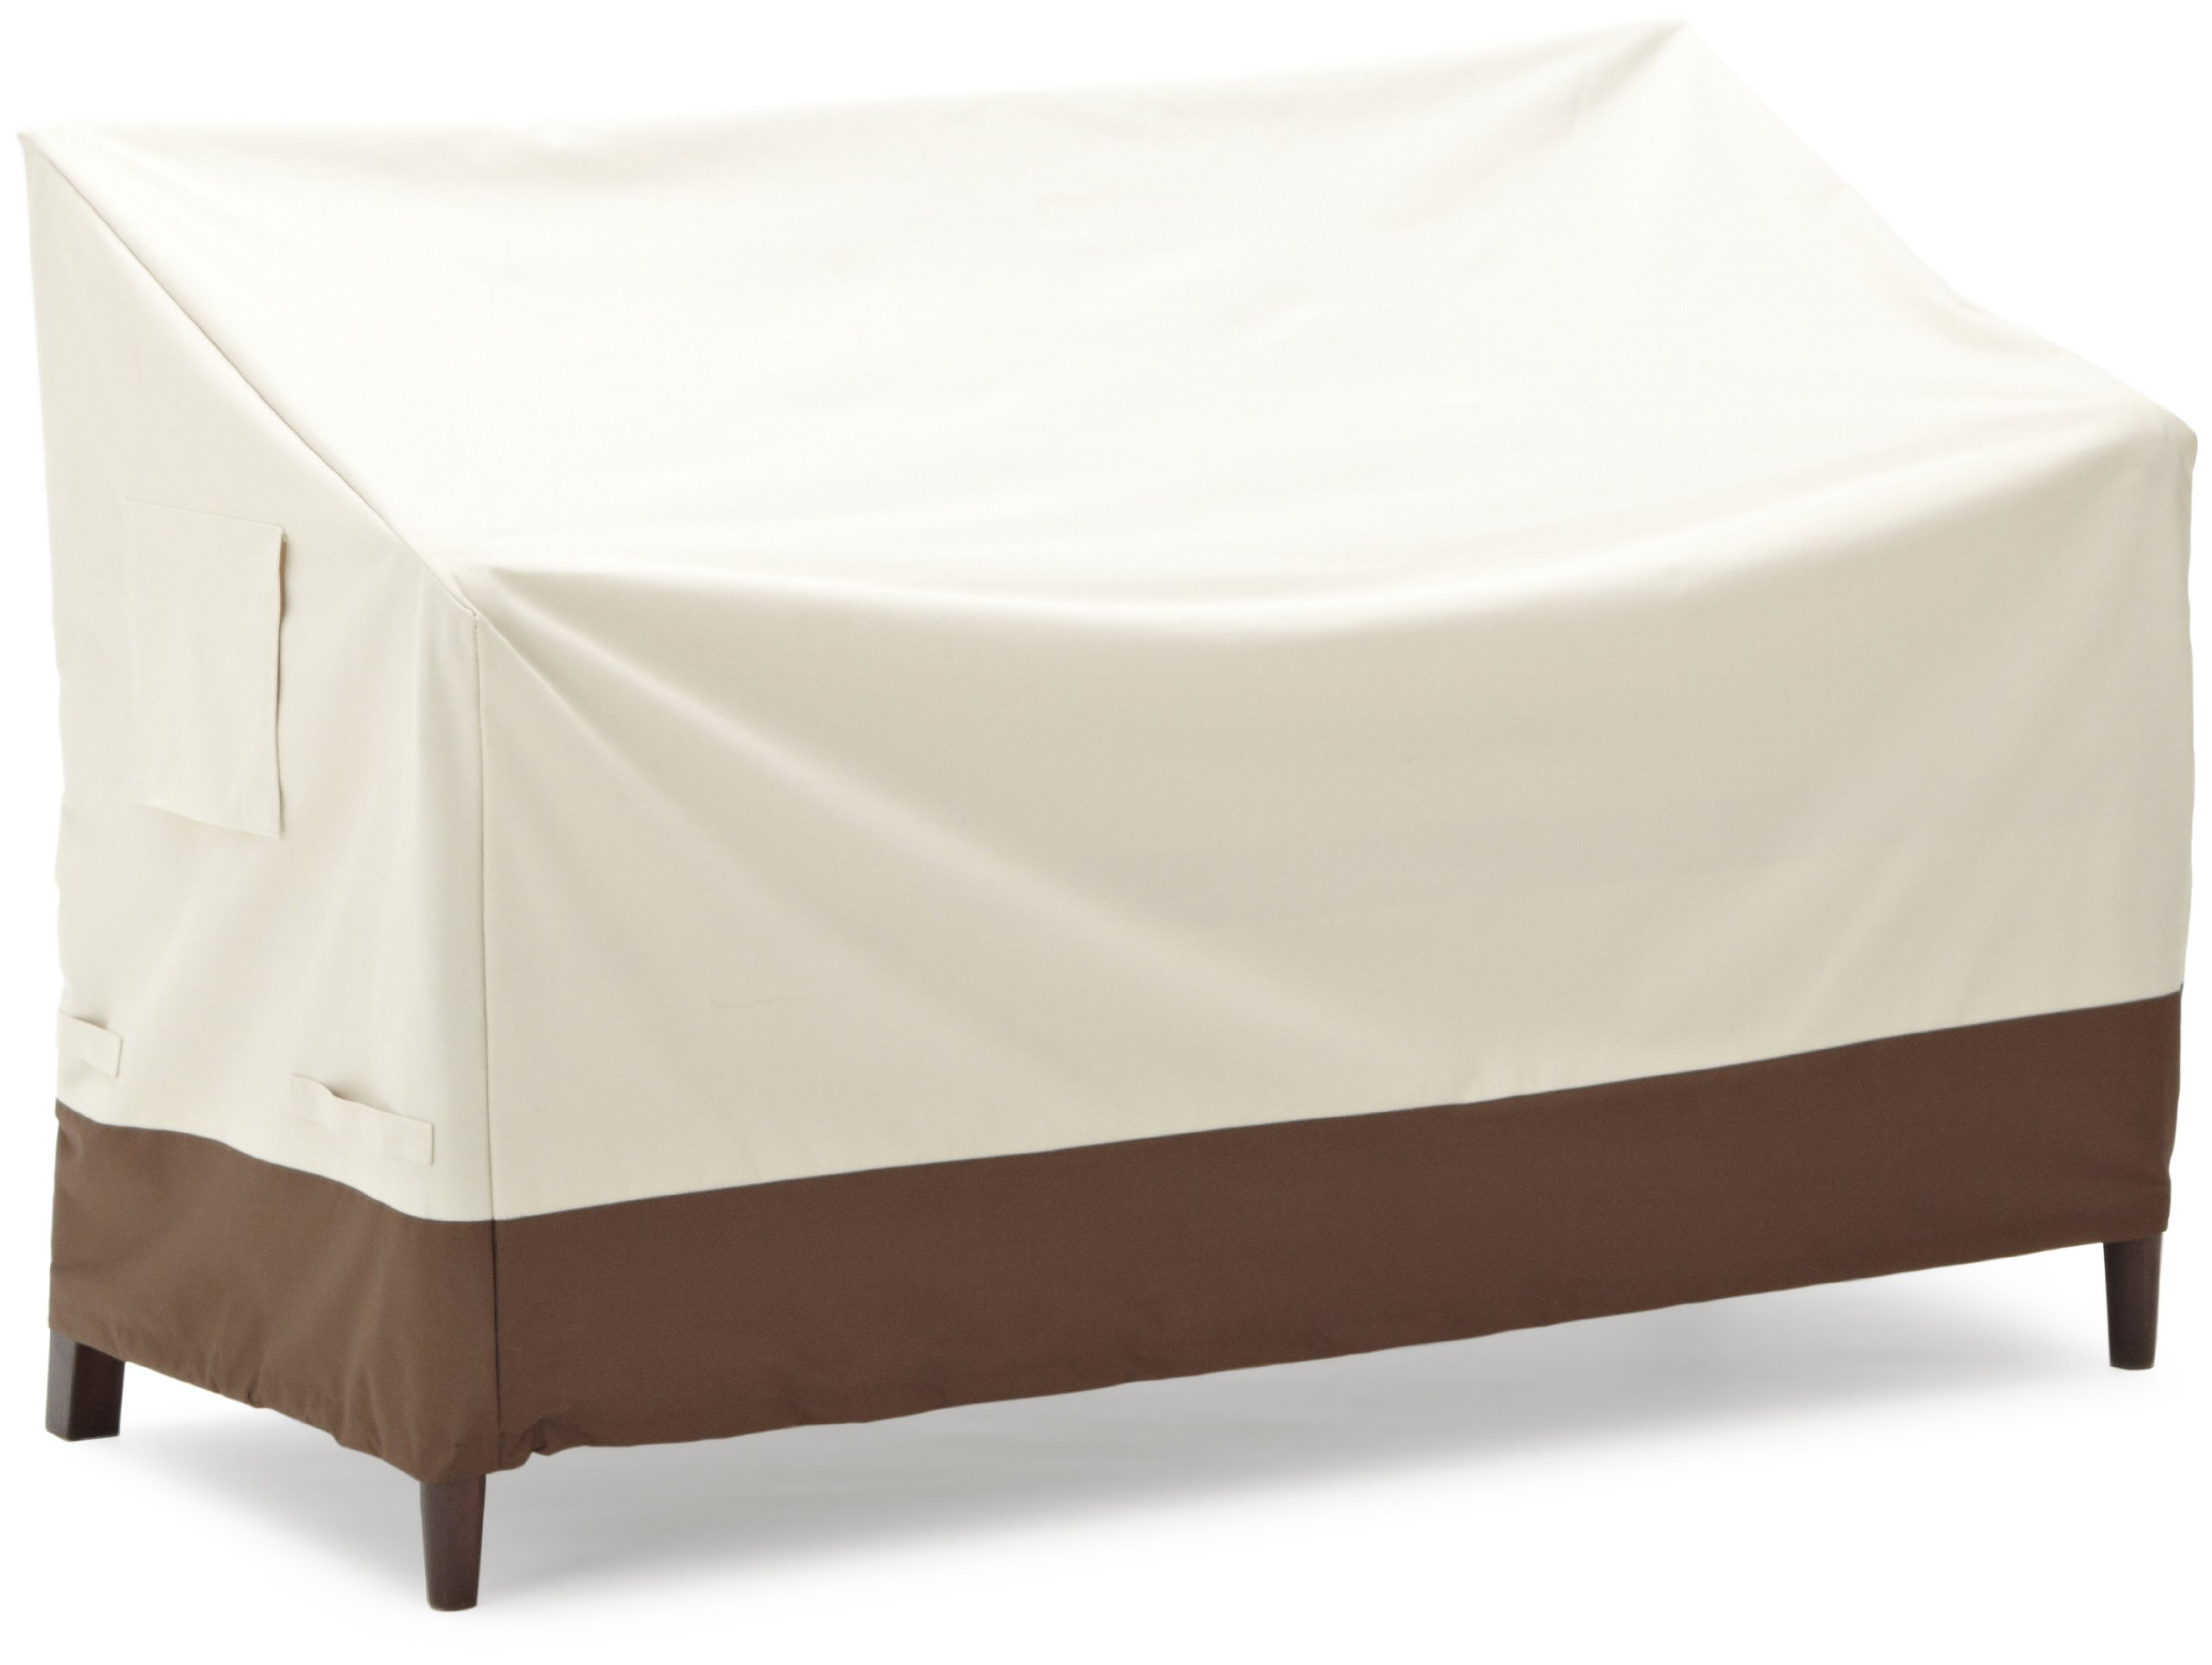 AmazonBasics 2-Seater Bench Patio Cover product image